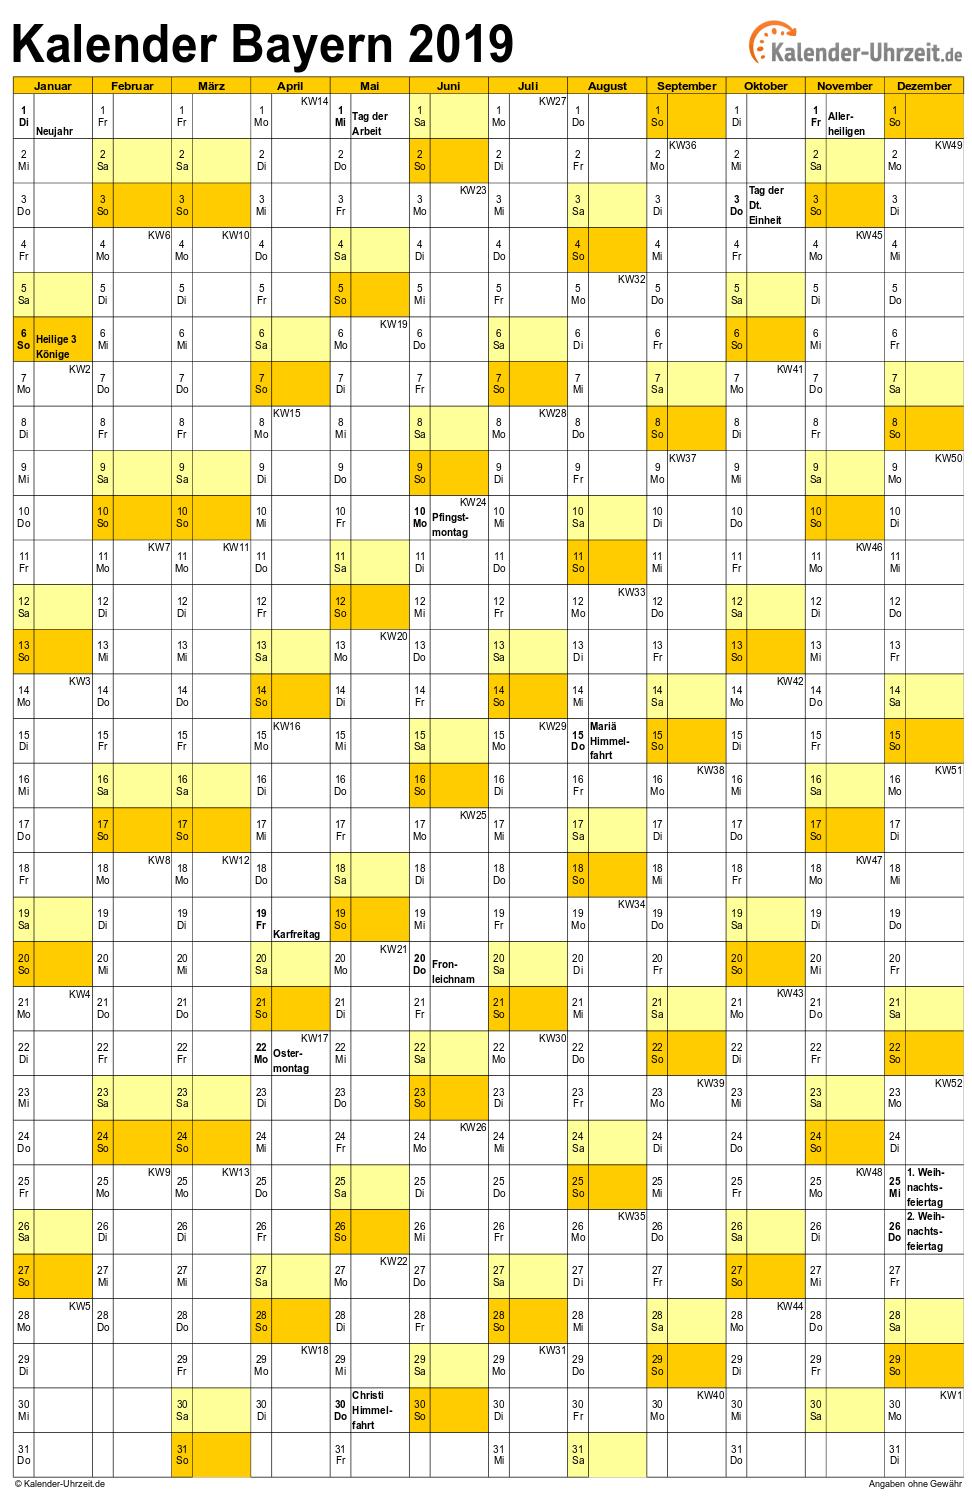 kalender bayern 2019